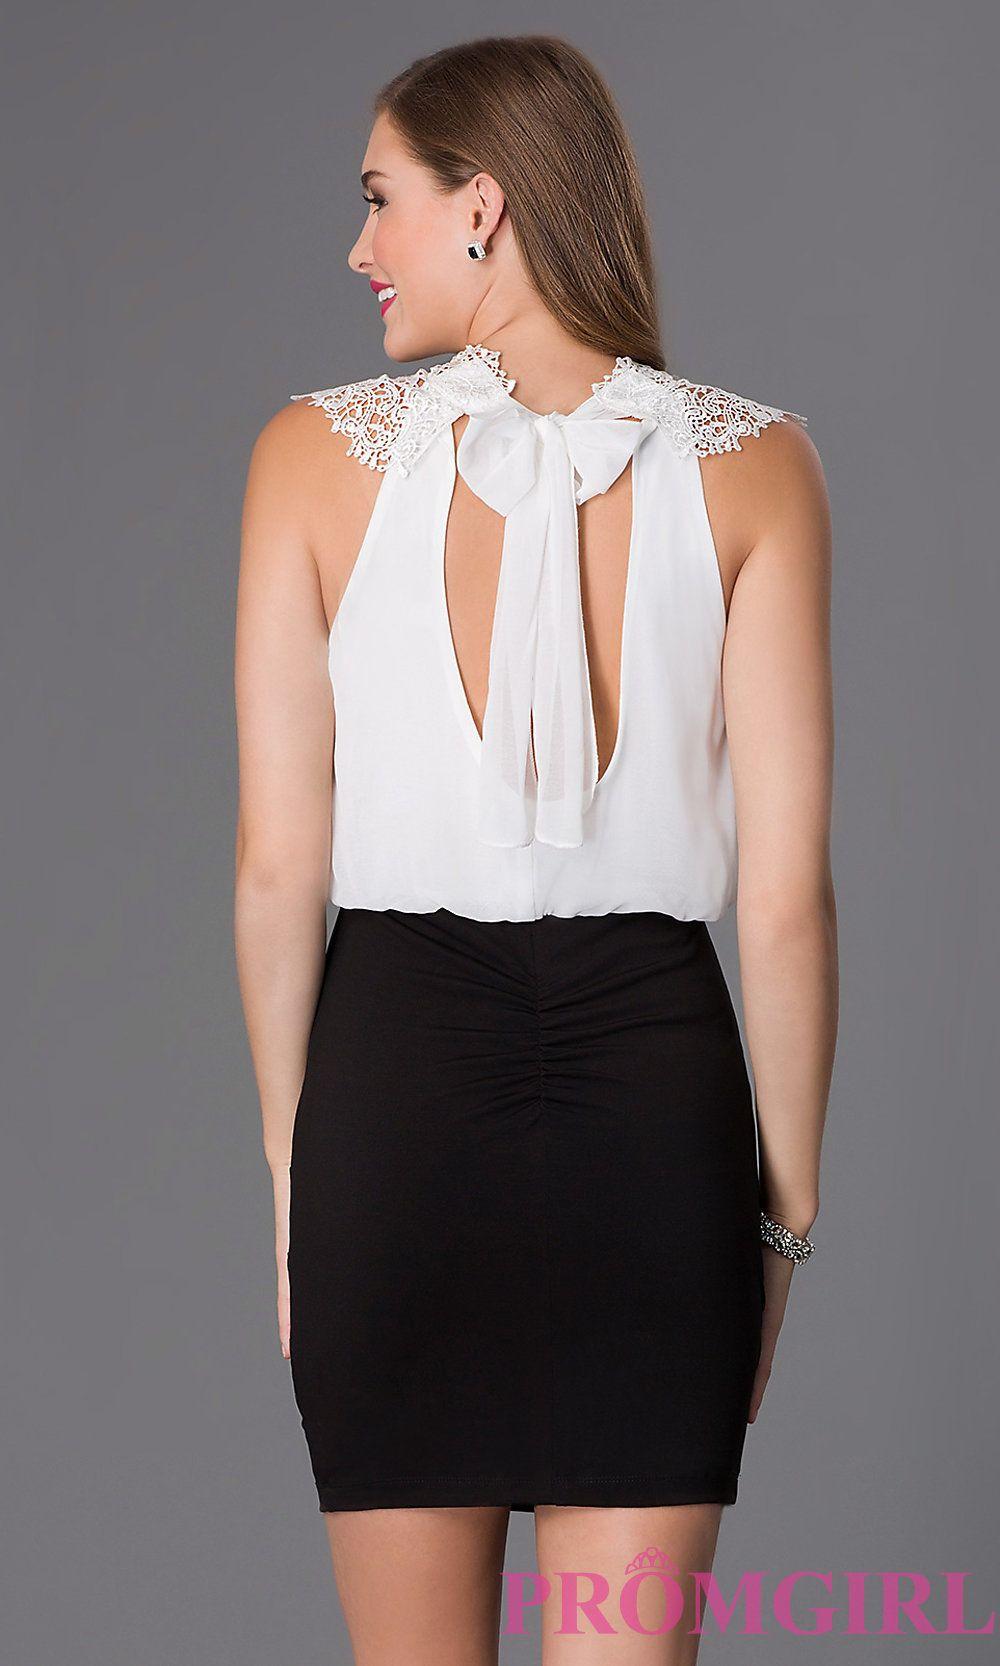 Short lace high neck dress by emerald sundae